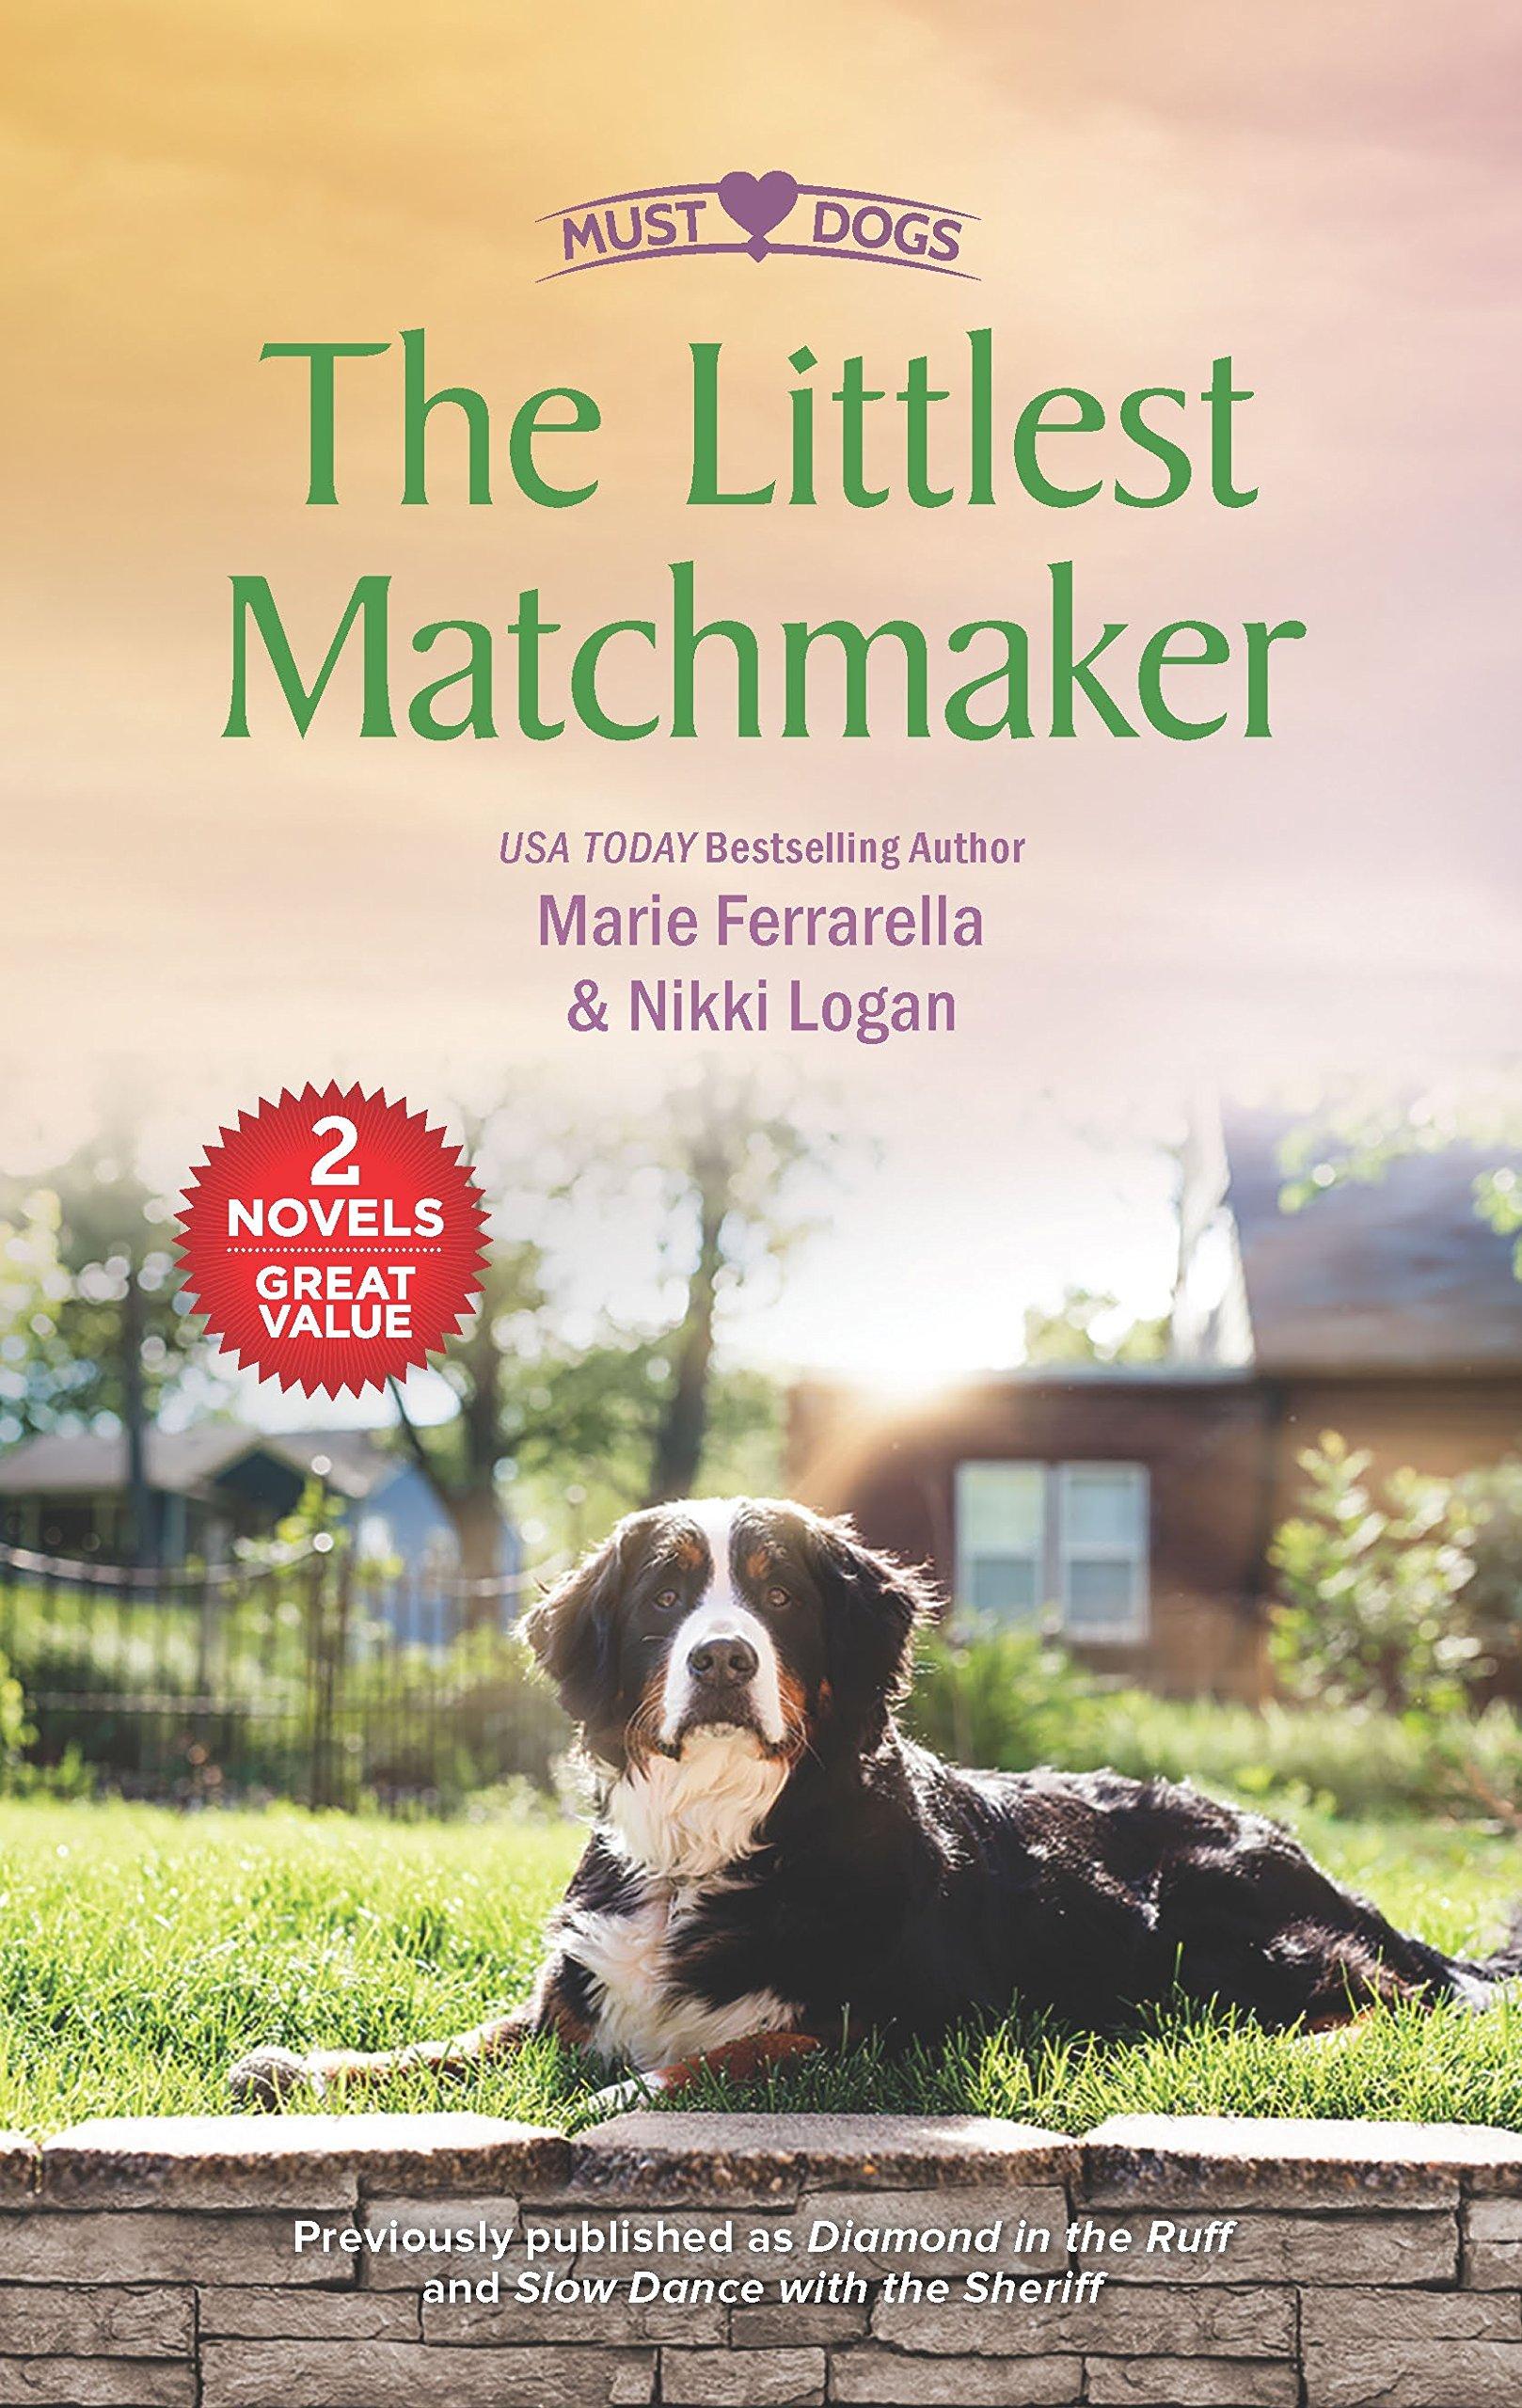 The Littlest Matchmaker: An Anthology (Must Love Dogs) PDF